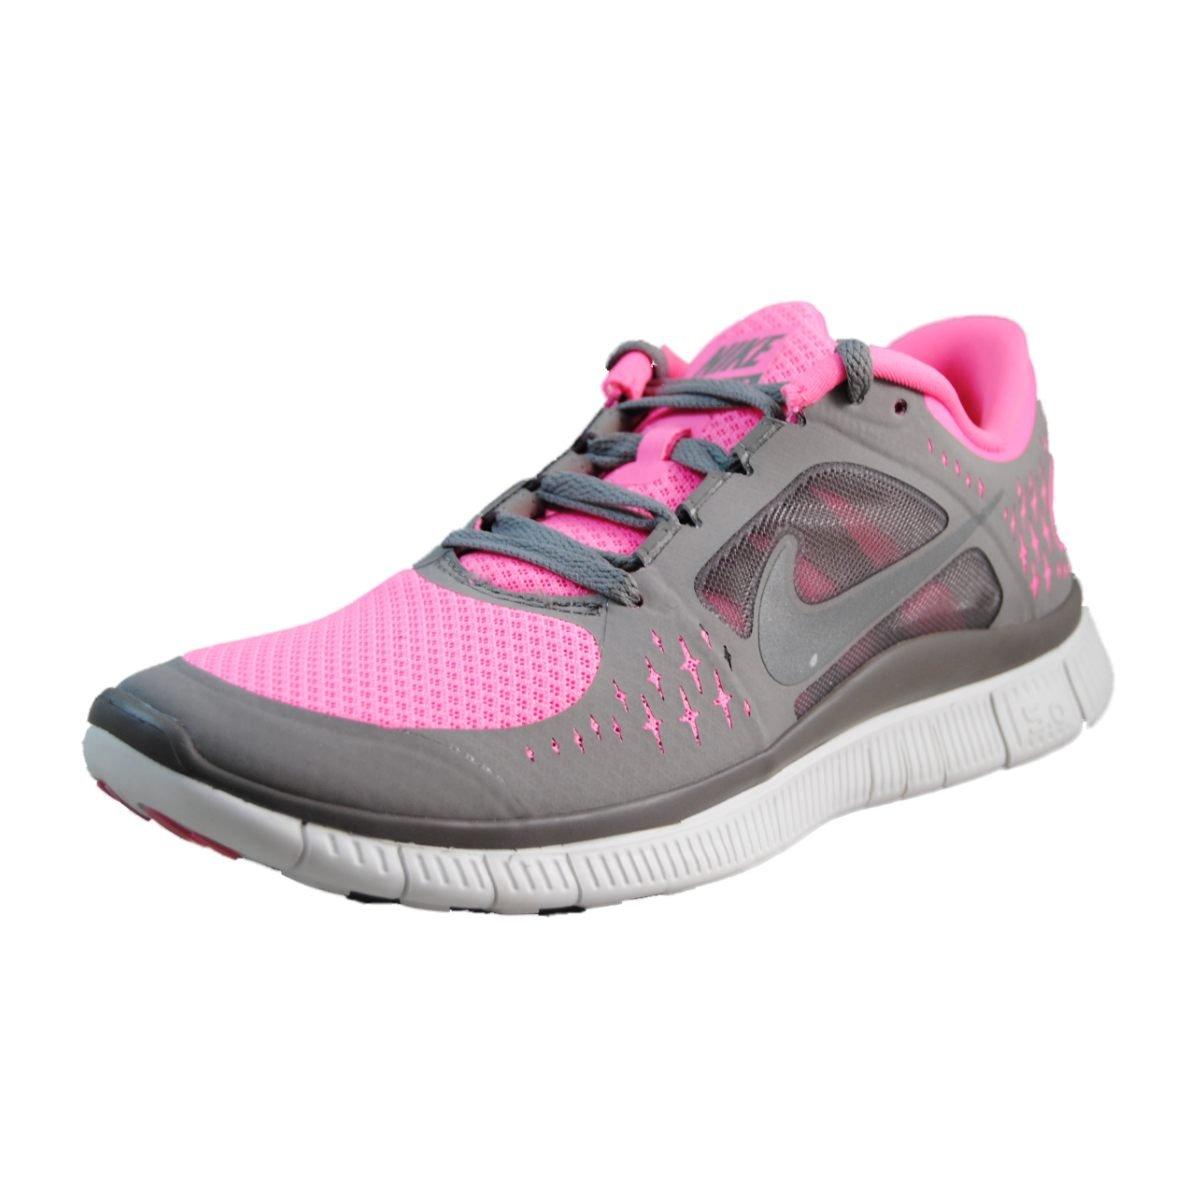 low priced 66de3 8c8fd Amazon.com   NIKE Women s Free Run 3 Polarized Pink Reflect Silver Spirit  Gray 9.5 Medium (B)   Road Running